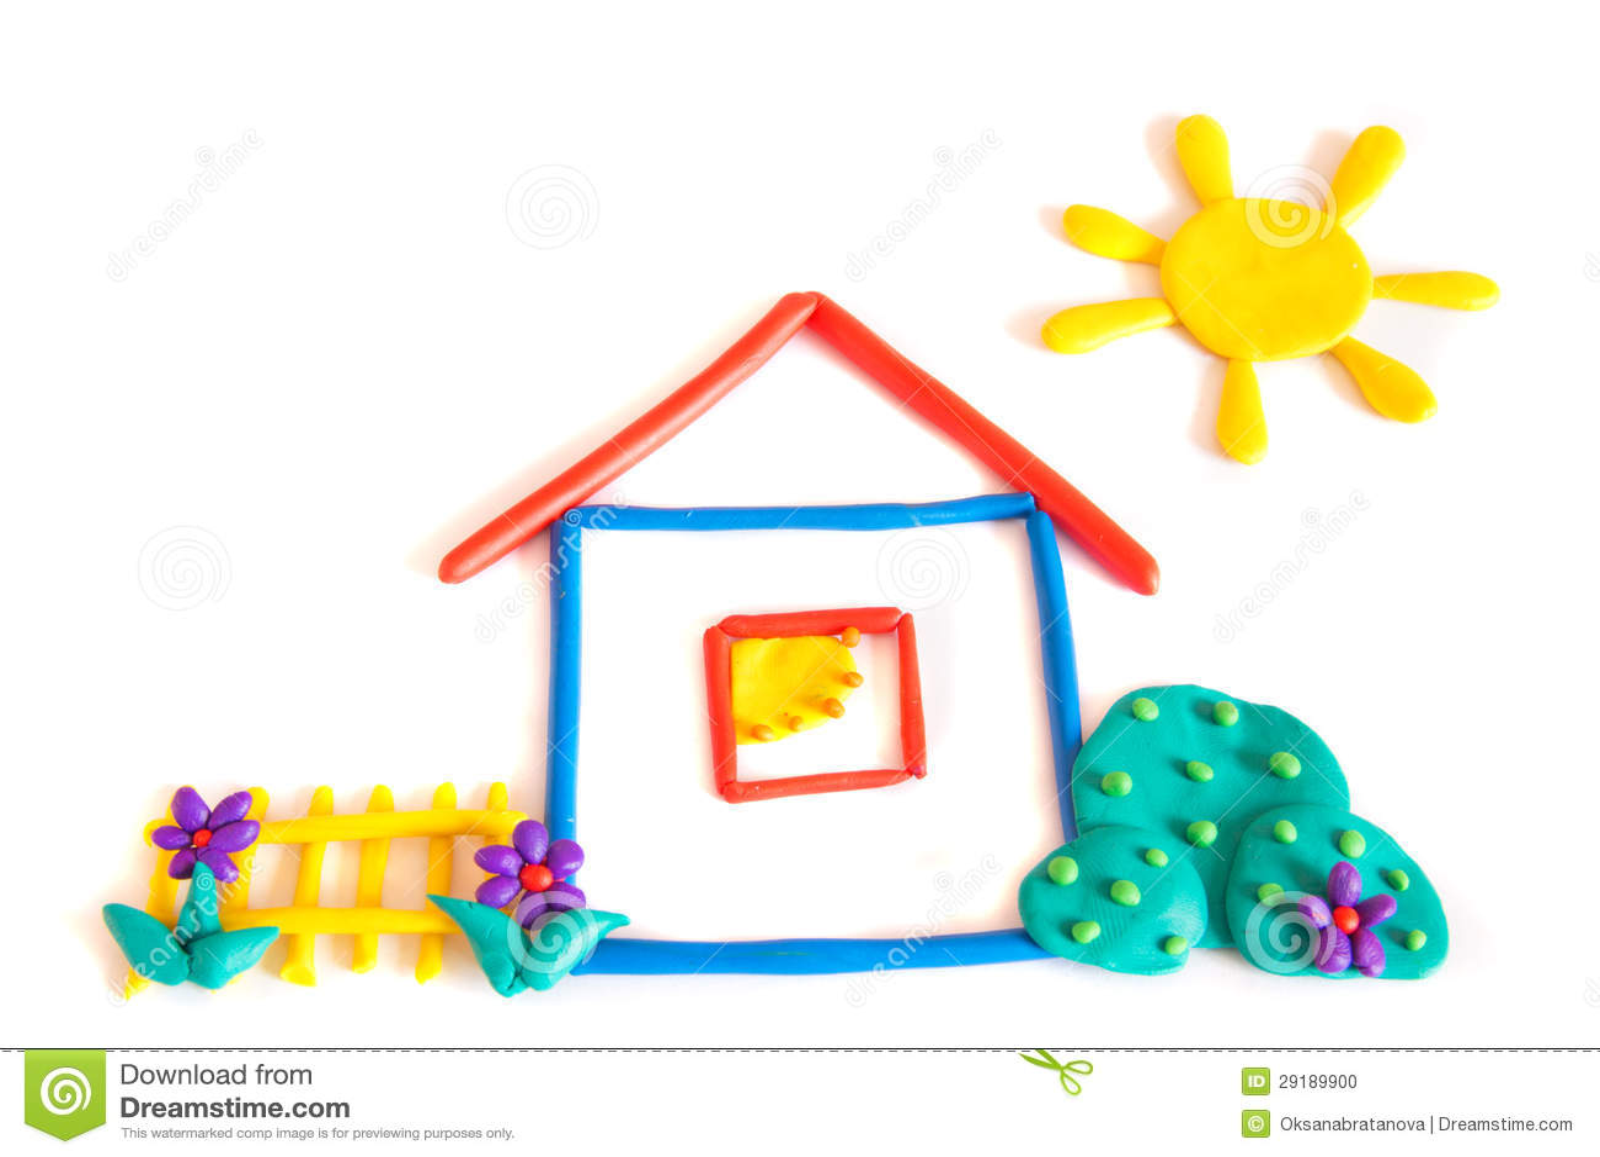 maison de p 226 te 224 modeler photo stock image 29189900